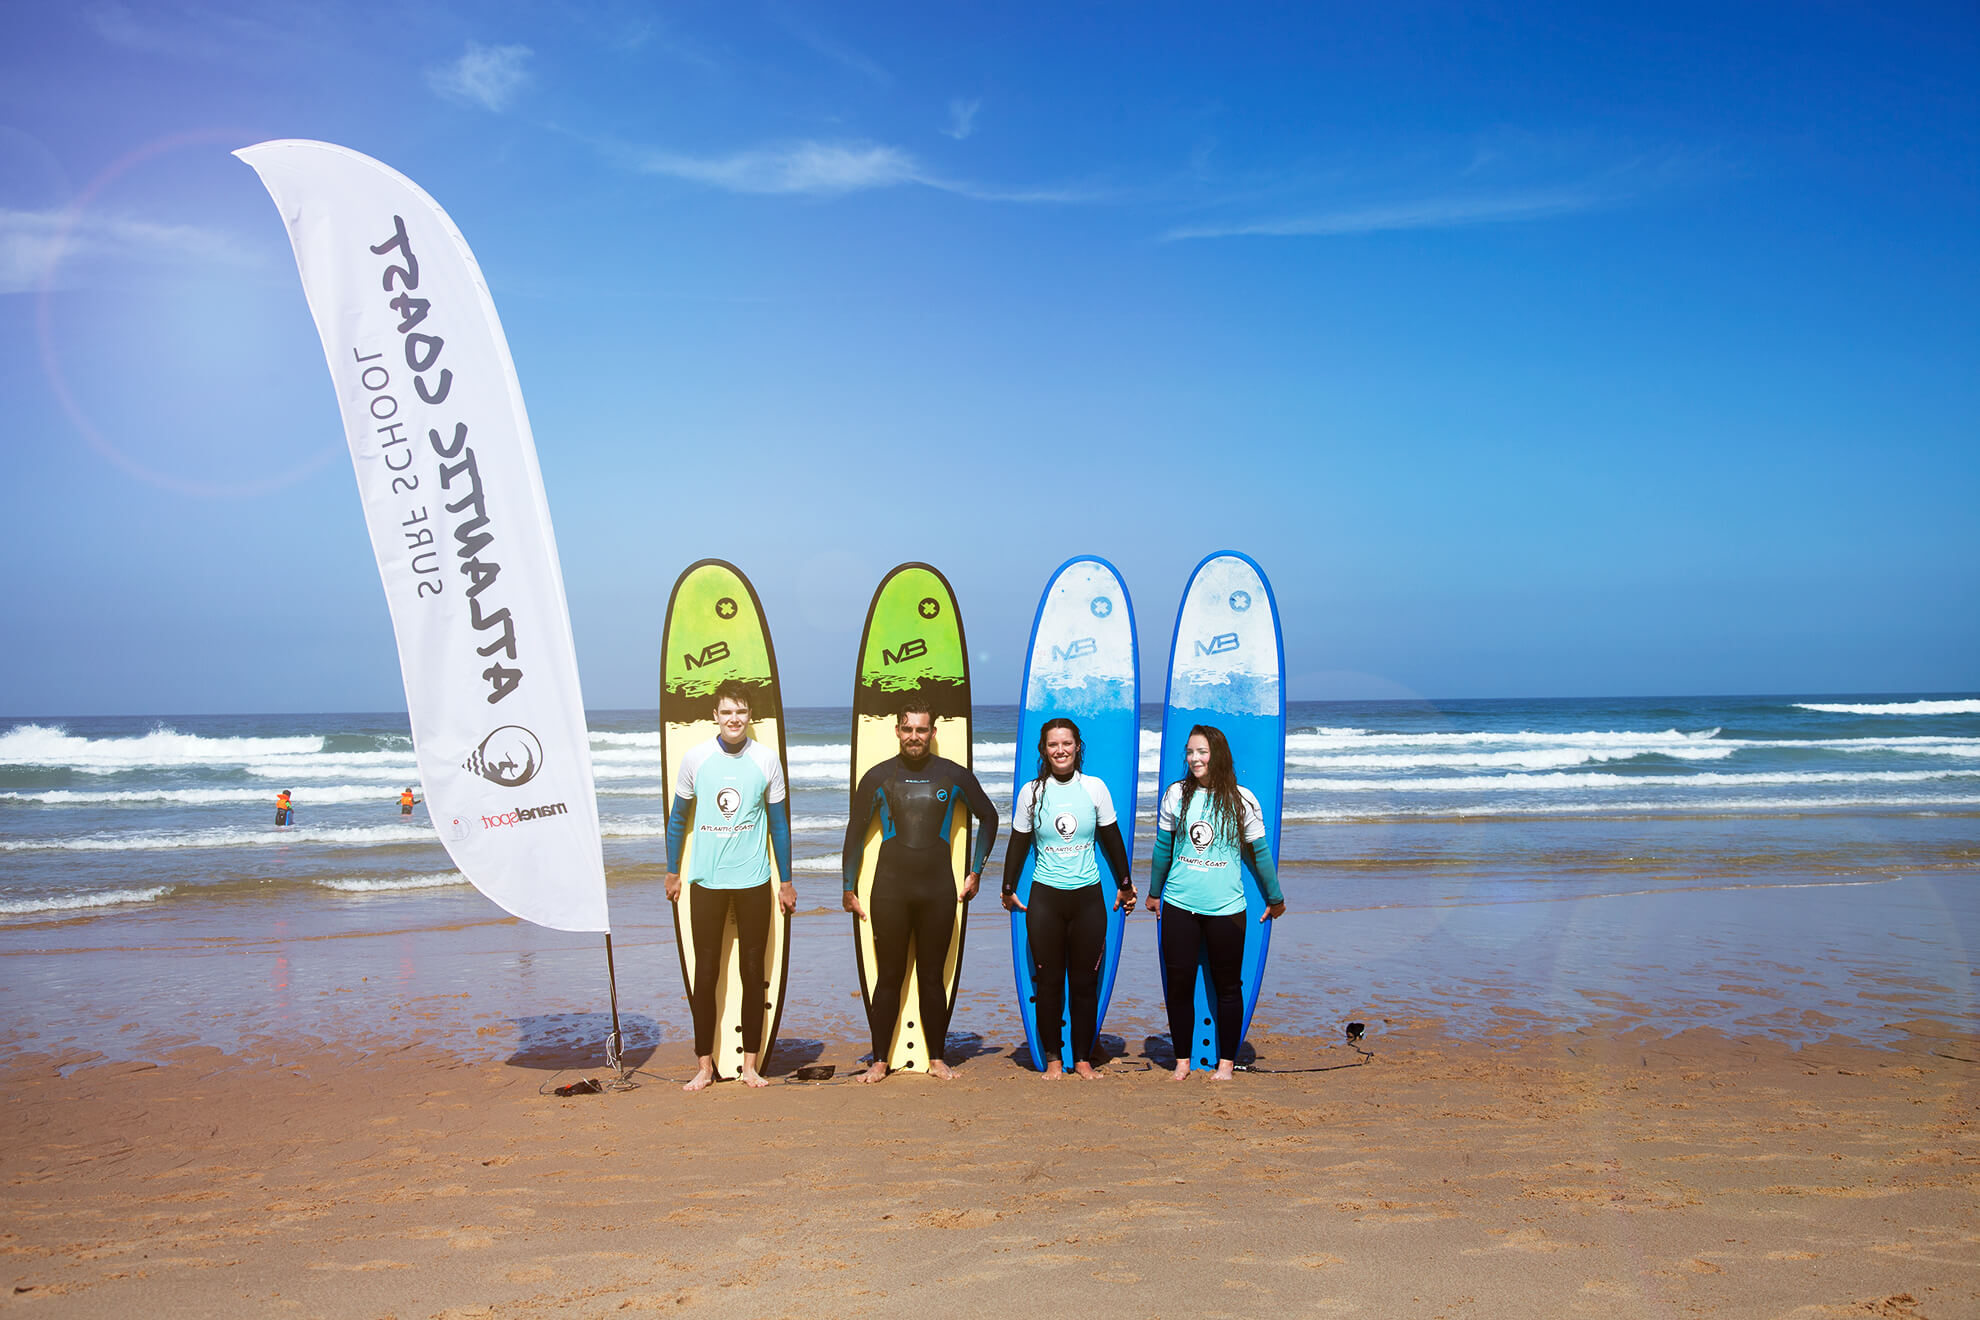 surfing after quarentine